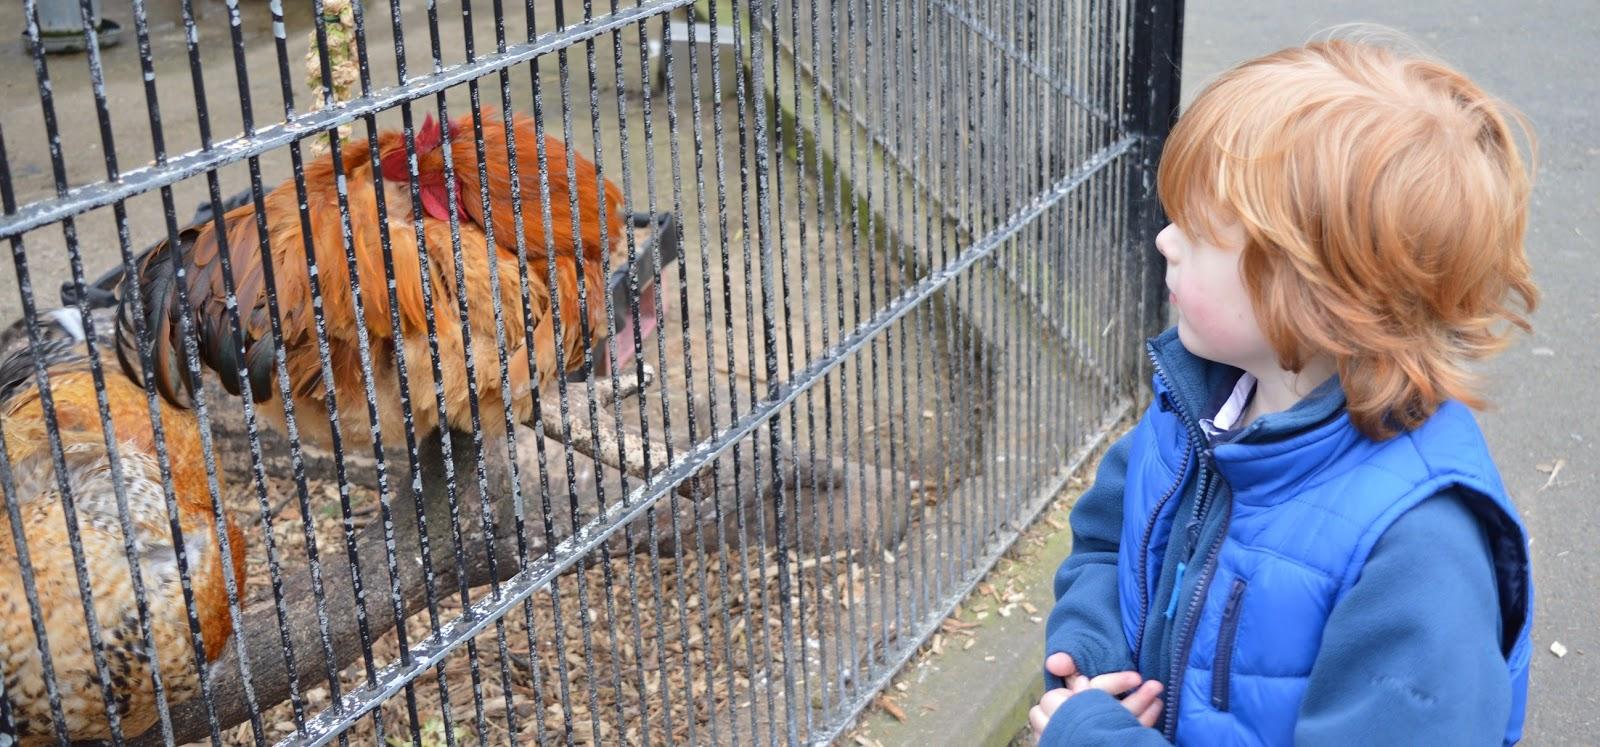 Saltwell Park Pet's Corner - chickens